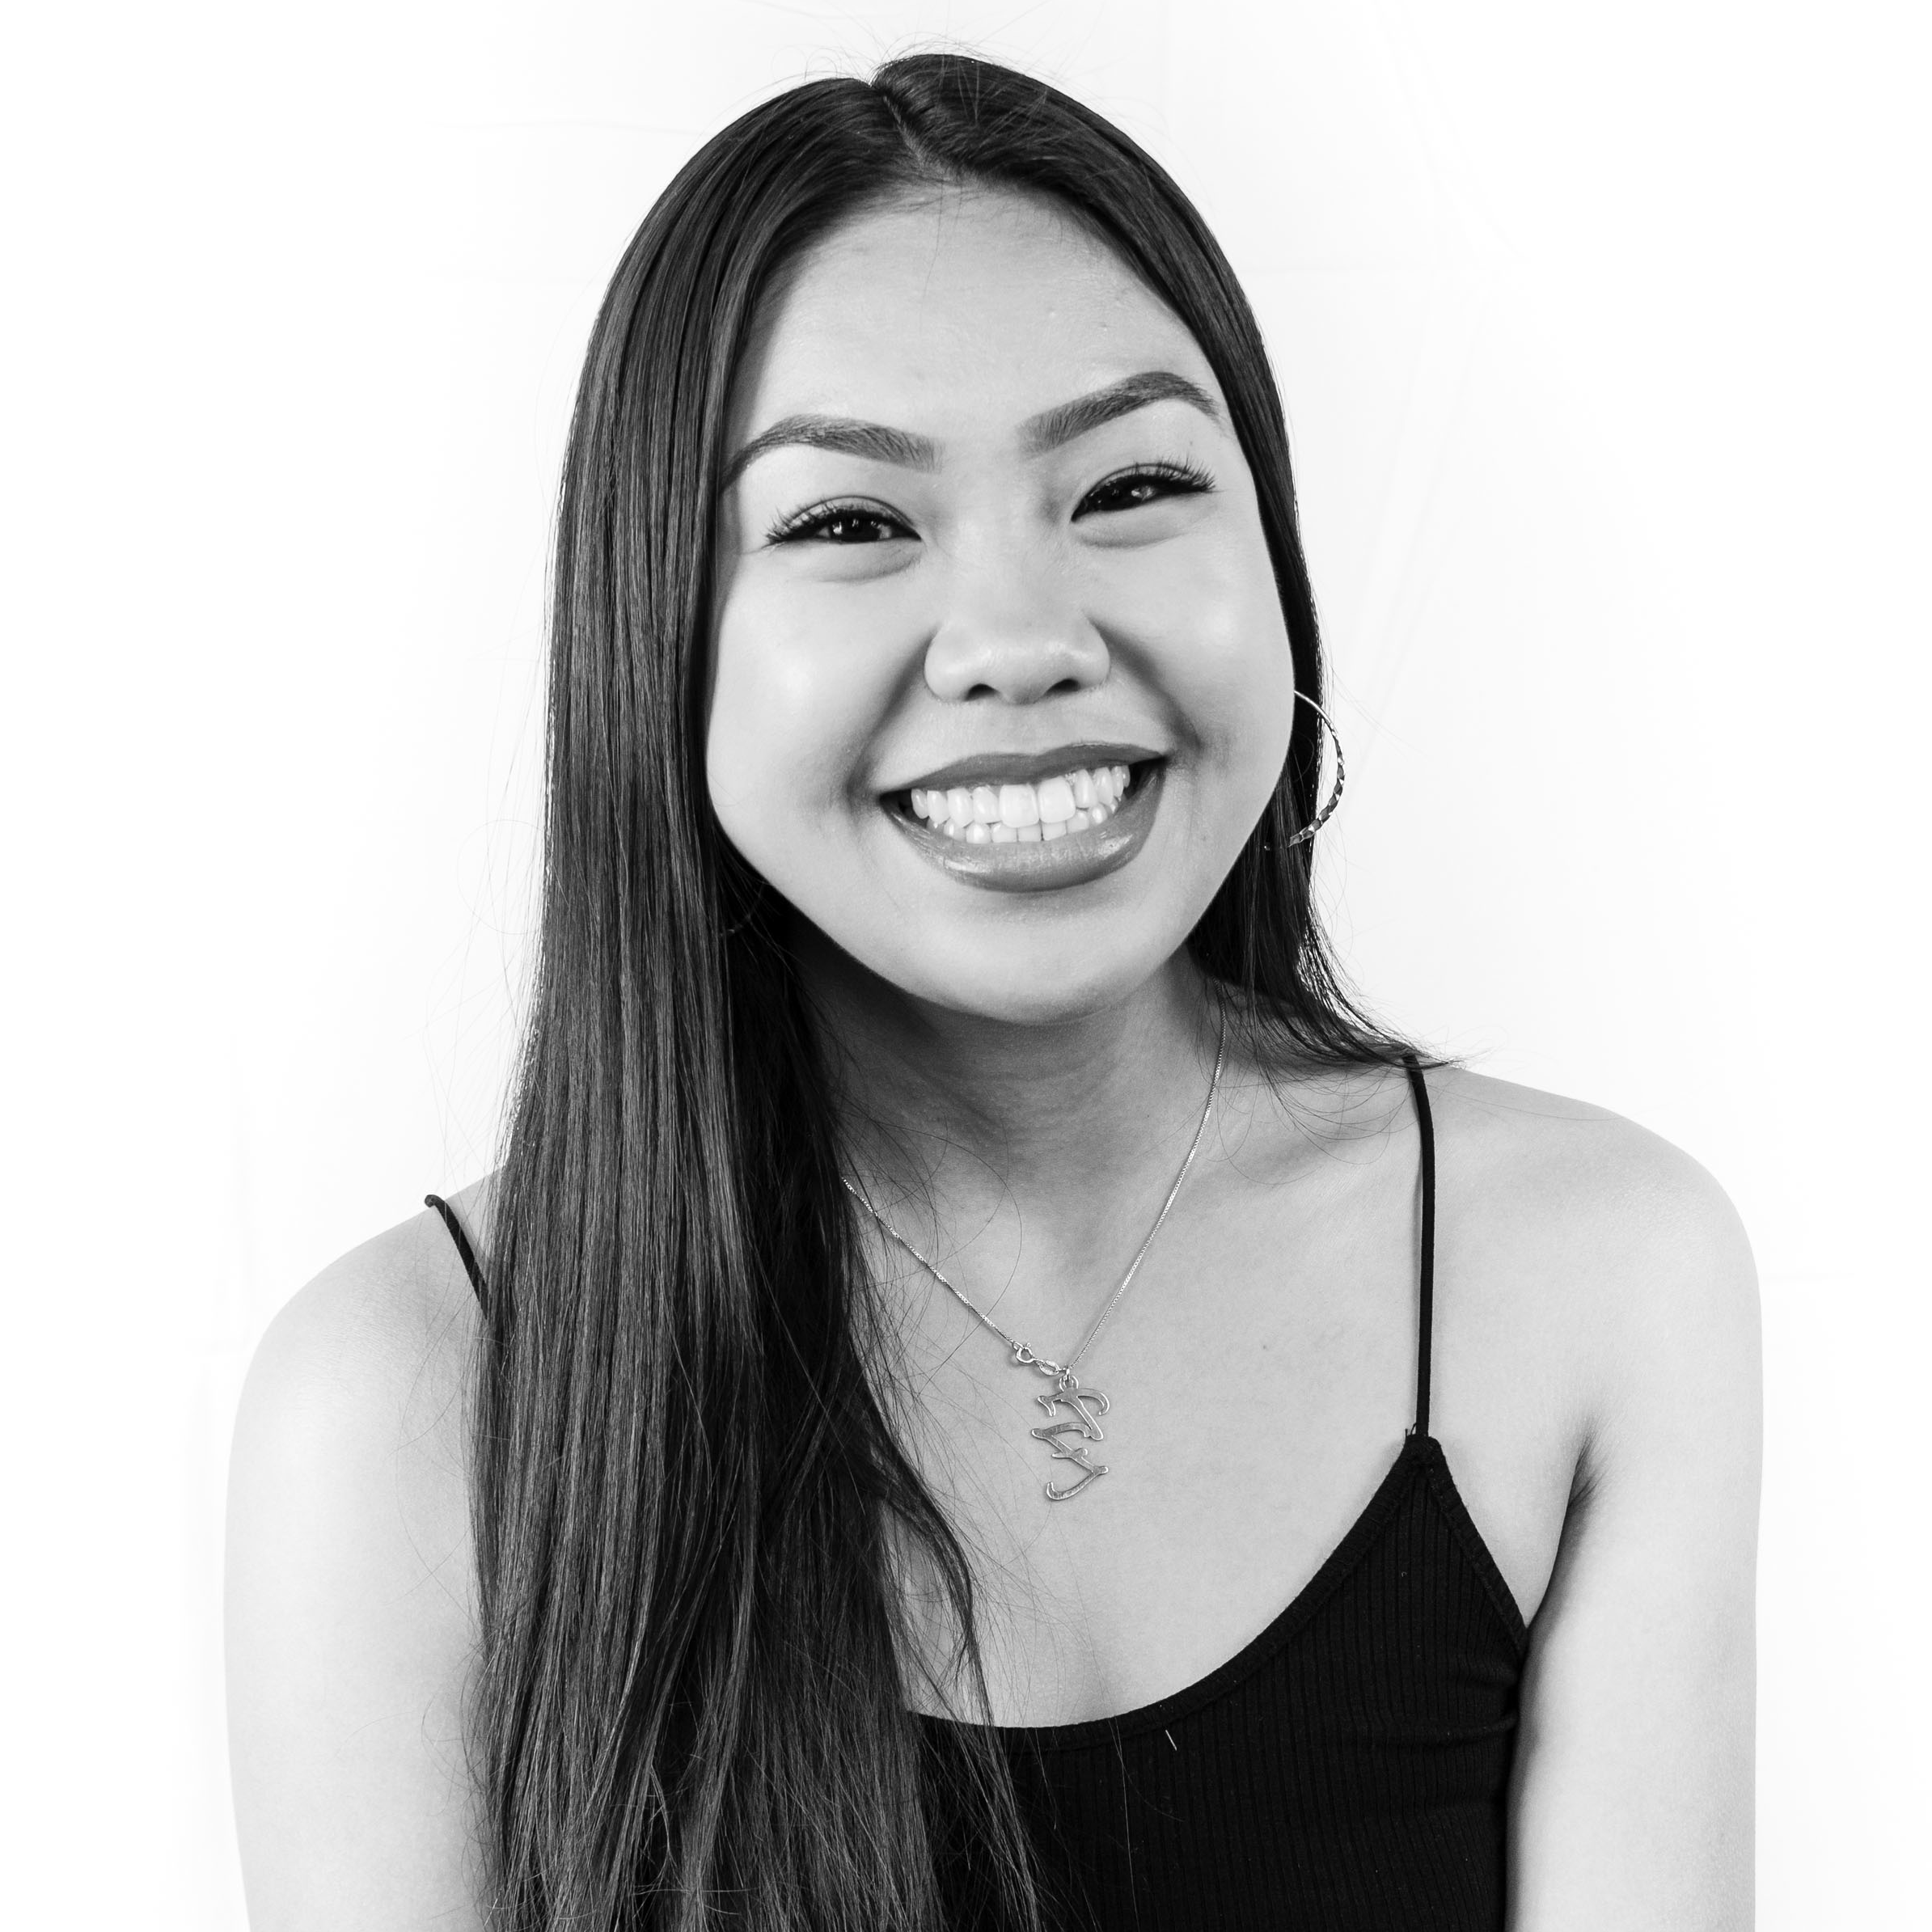 Alyssa Tolentino from Central Computers